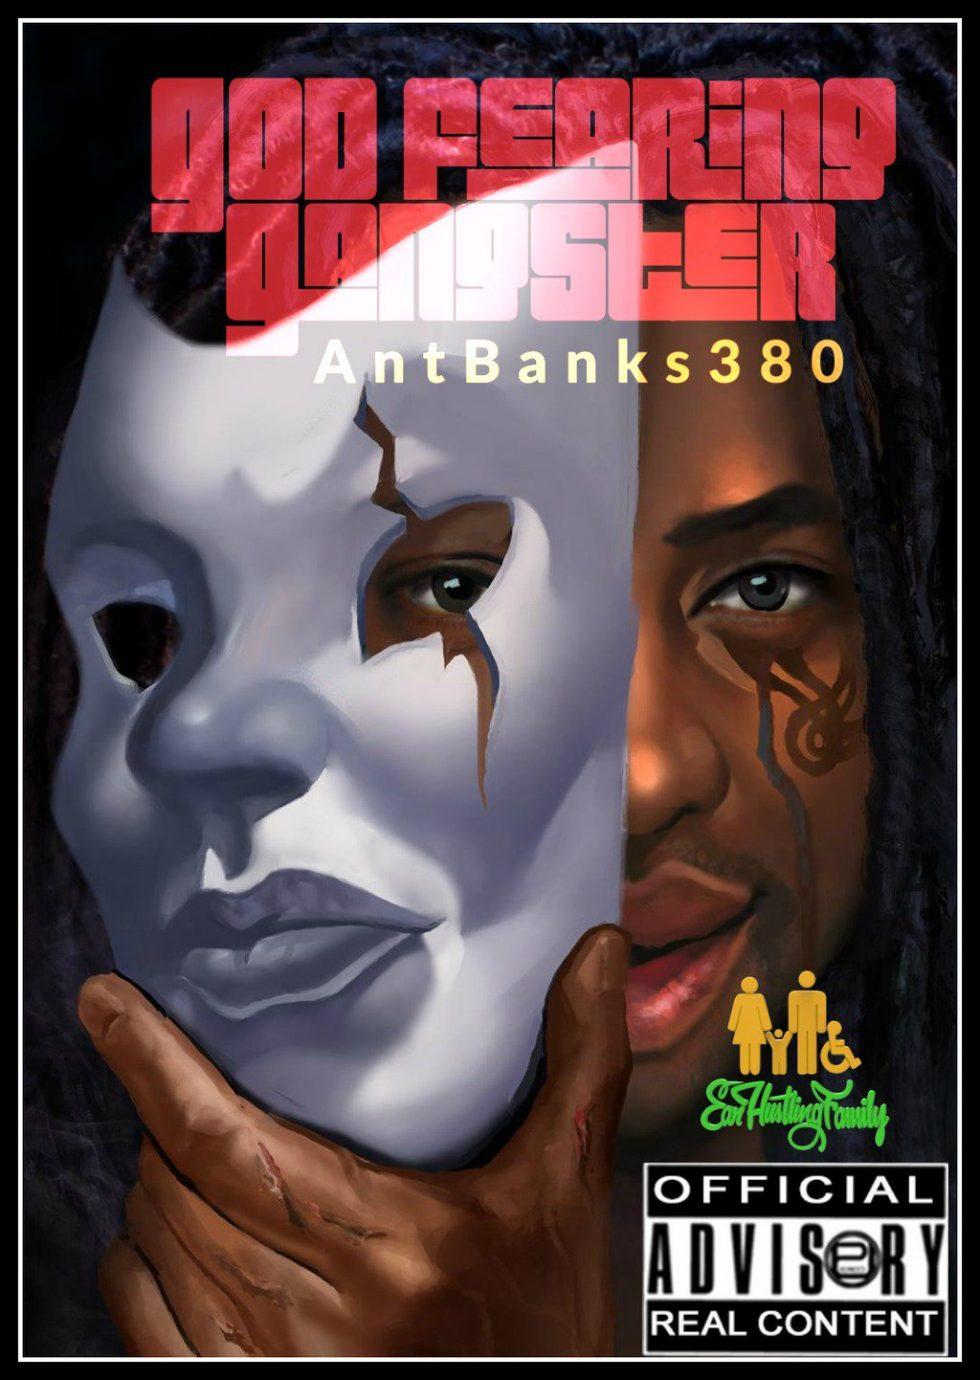 @EarHustlingFam – Inspirational Hip-Hop #AntBanks380